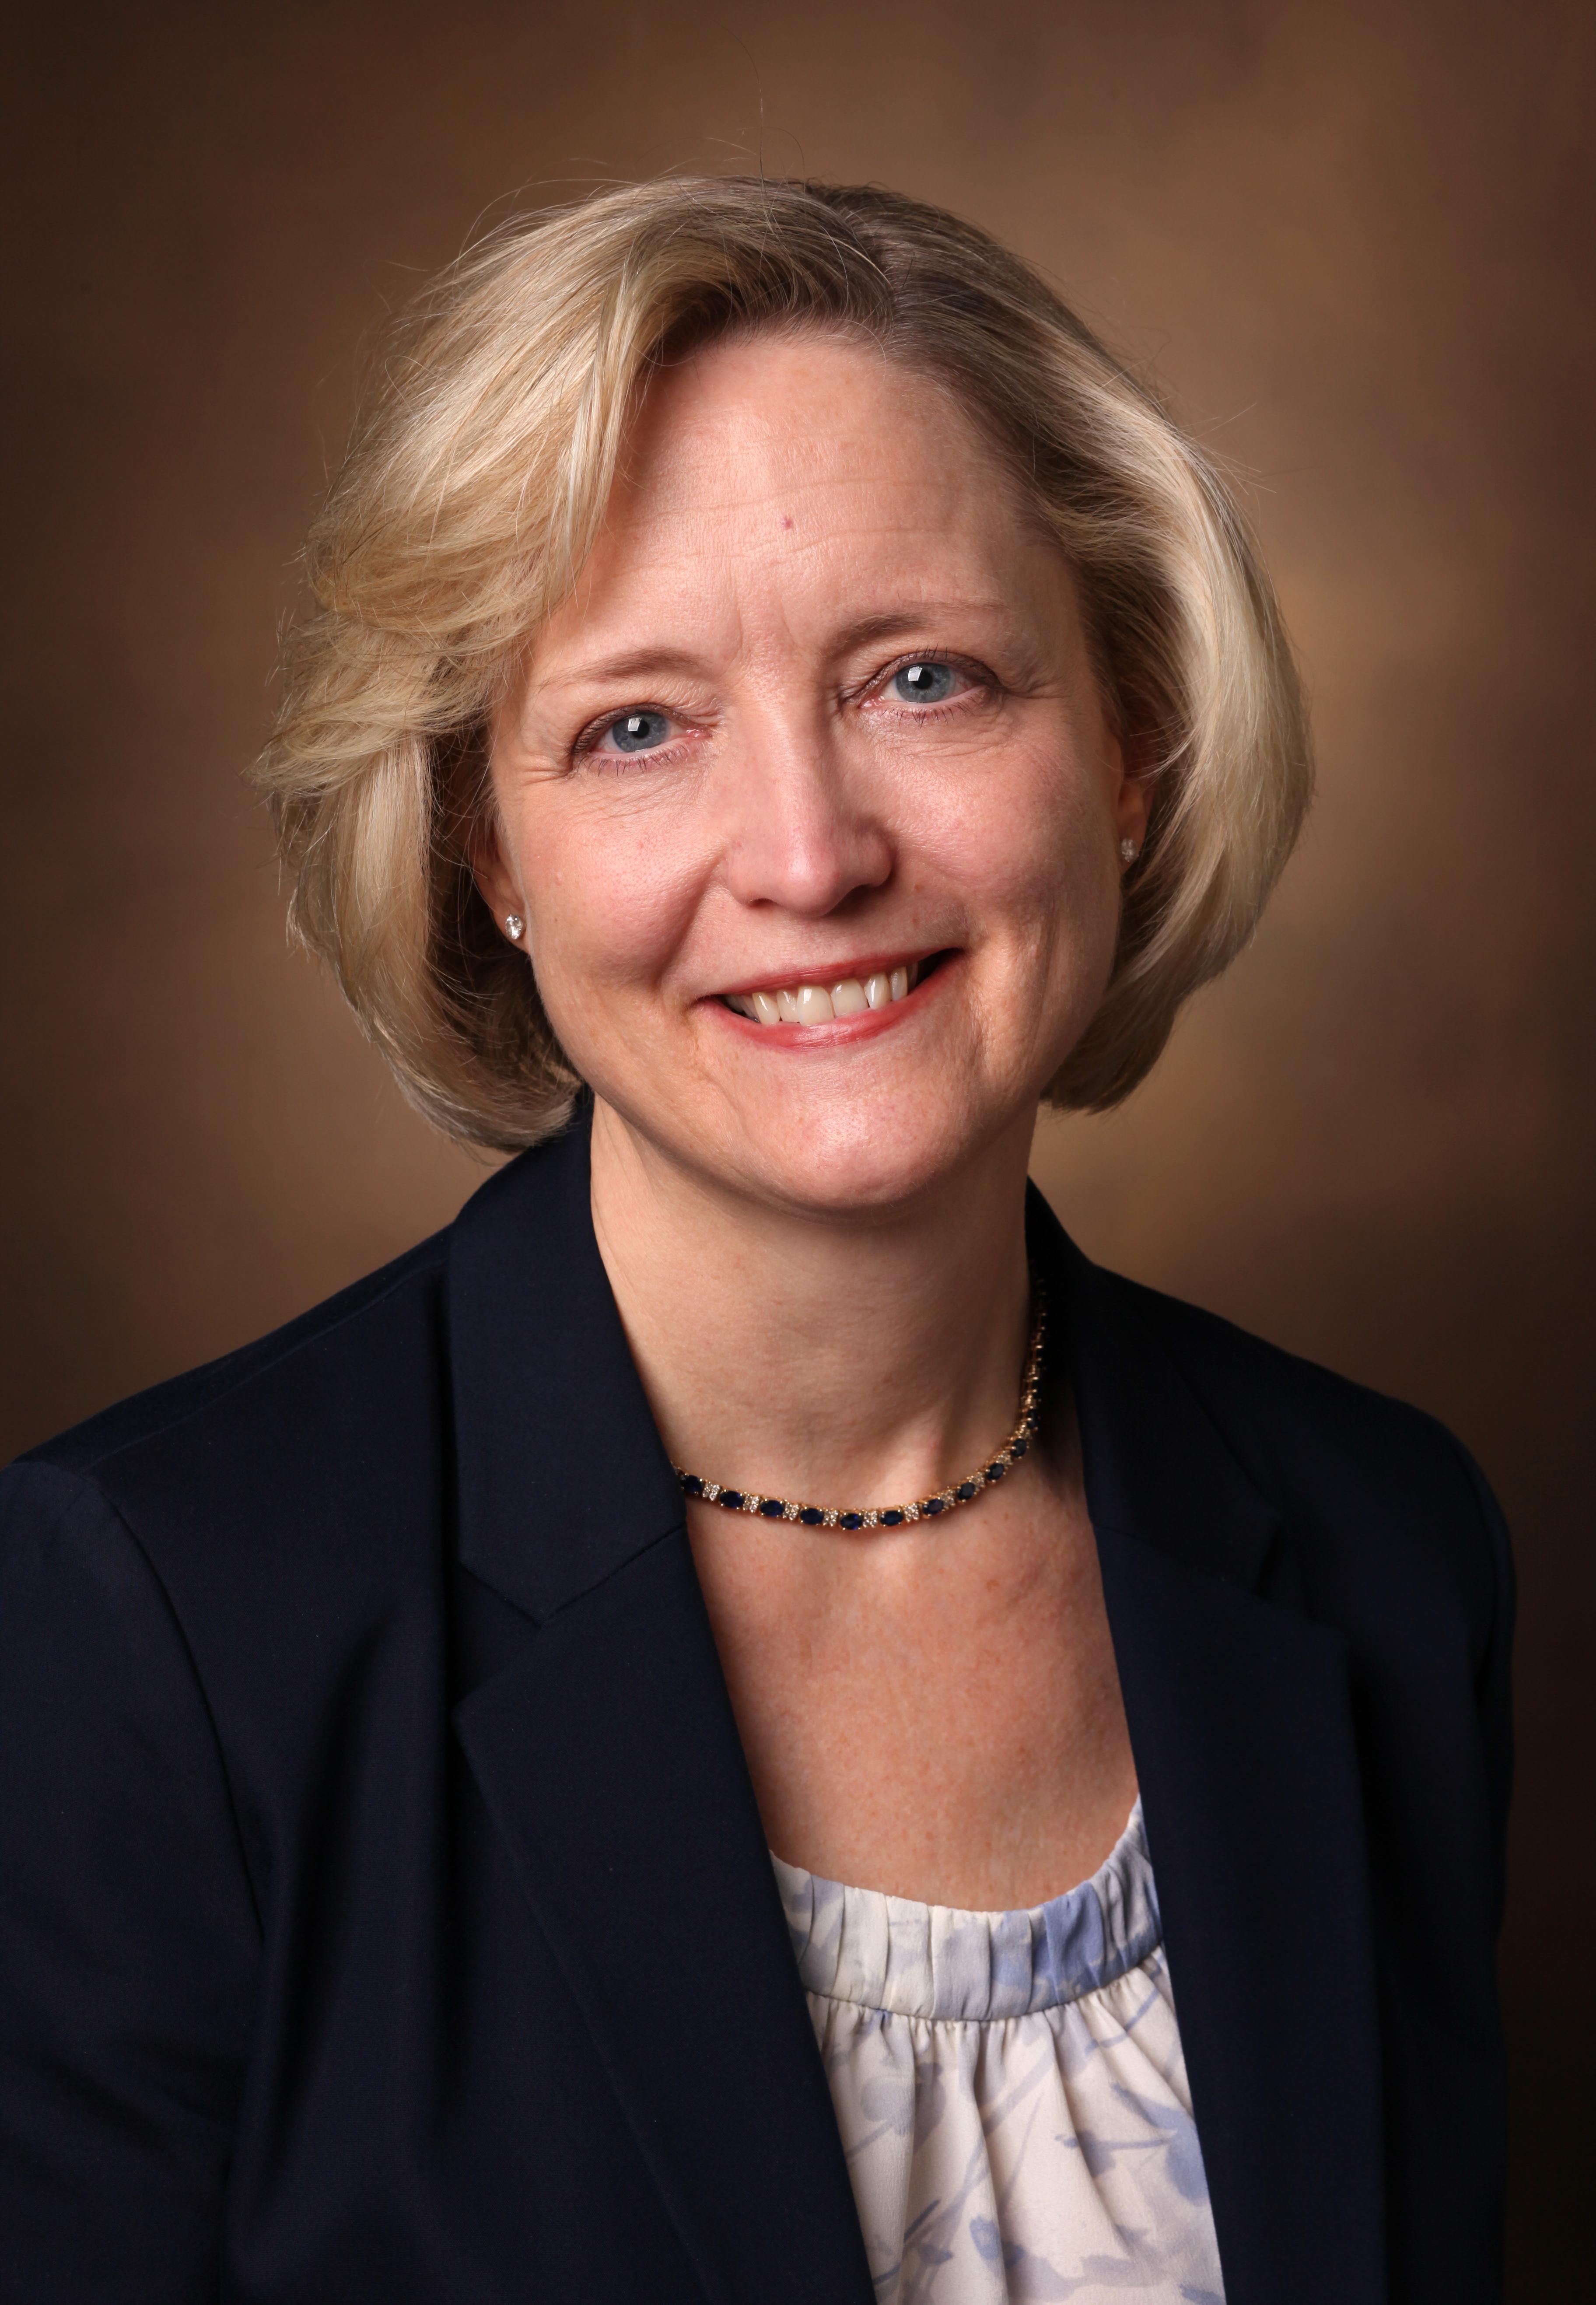 Provost and Vice Chancellor for Academic Affairs Susan R. Wente (Vanderbilt University